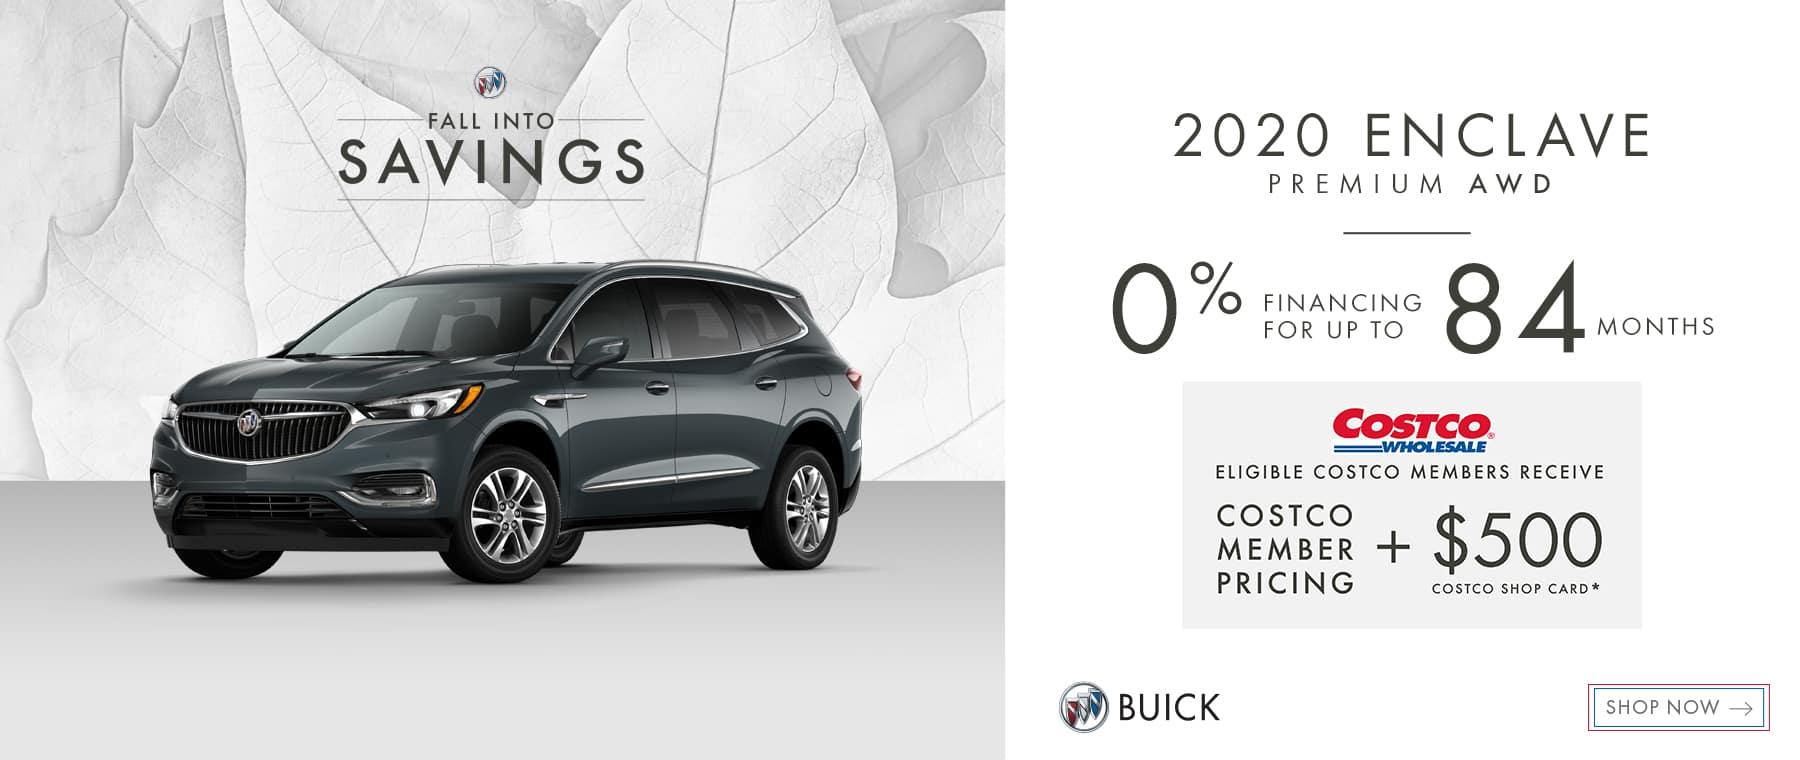 2020_WST_NOV_Buick_ENCLAVE_PREMIUM_AWD_T3_1800X760_v1